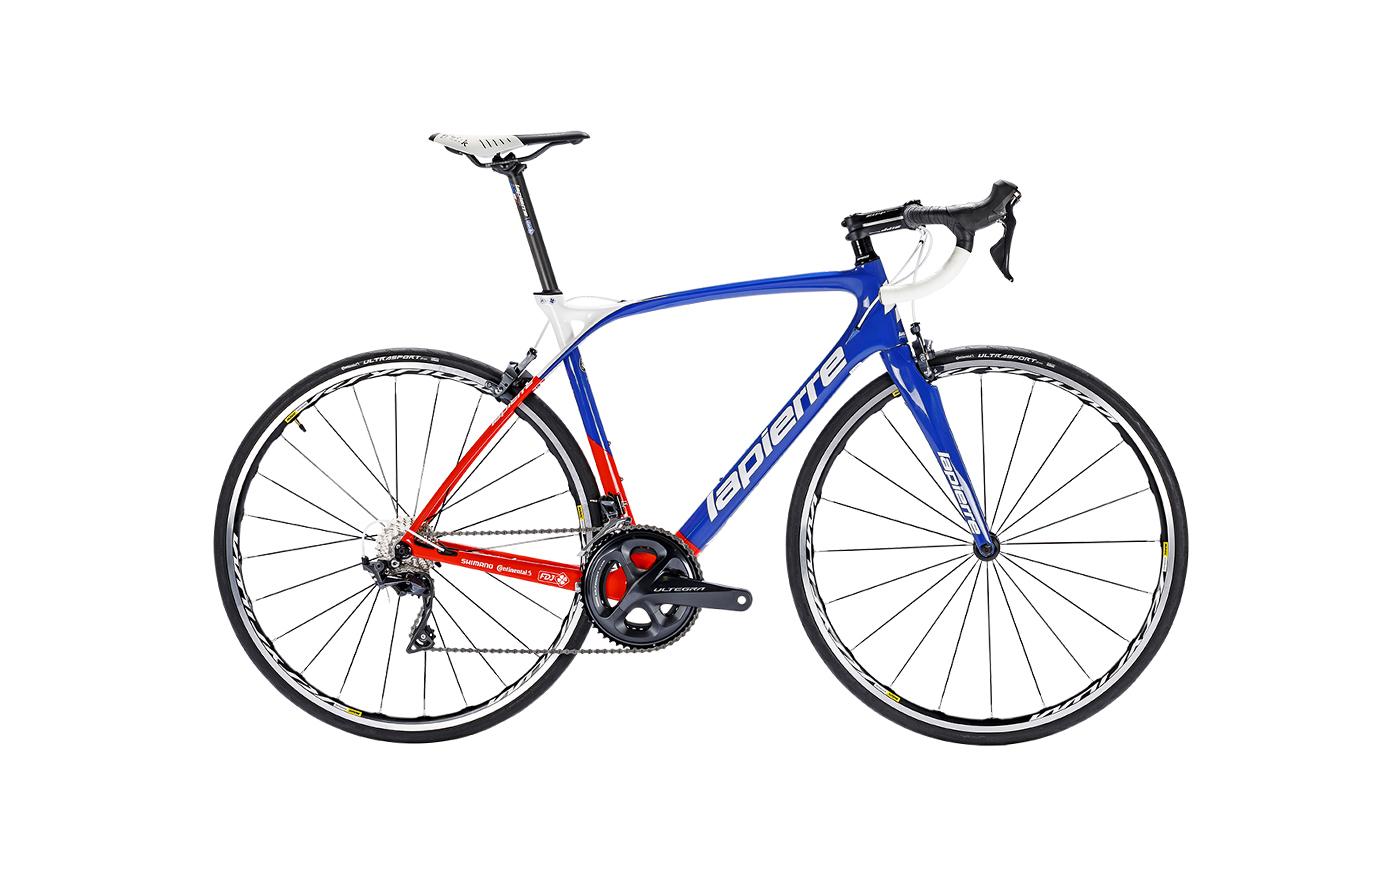 Bicykel LAPIERRE XELIUS SL 600 FDJ MC 2018